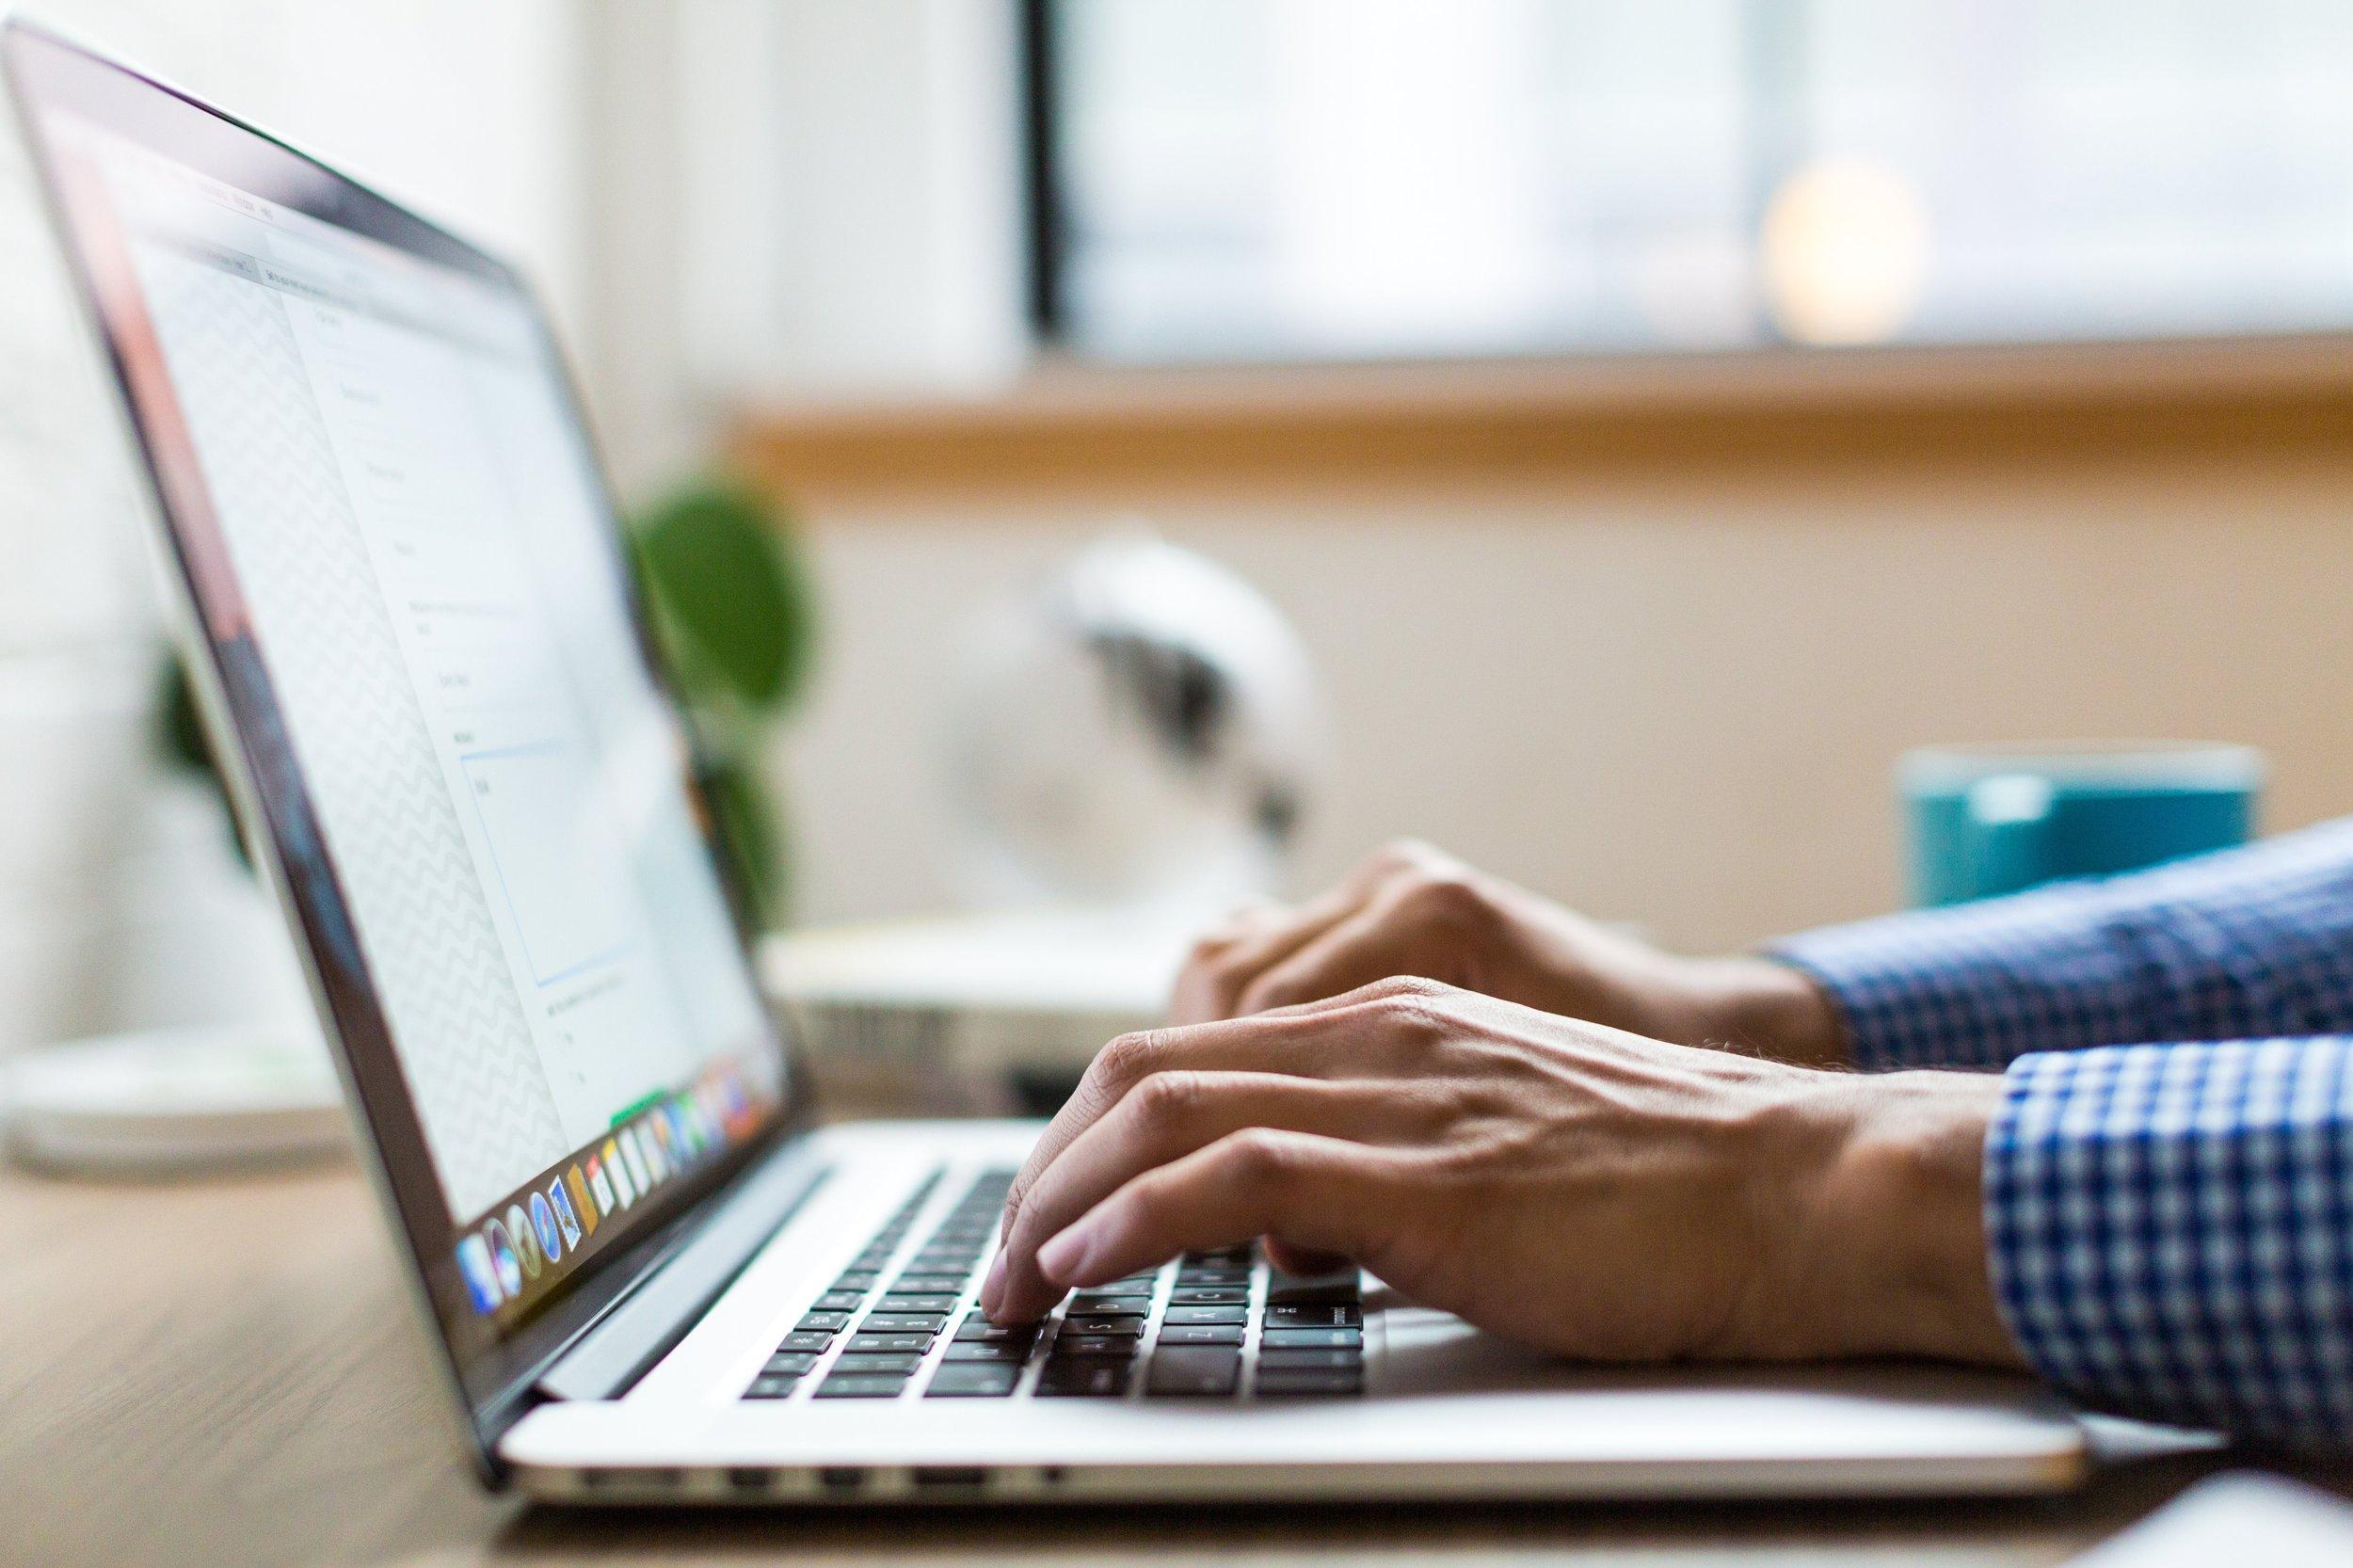 man-on-computer-typing